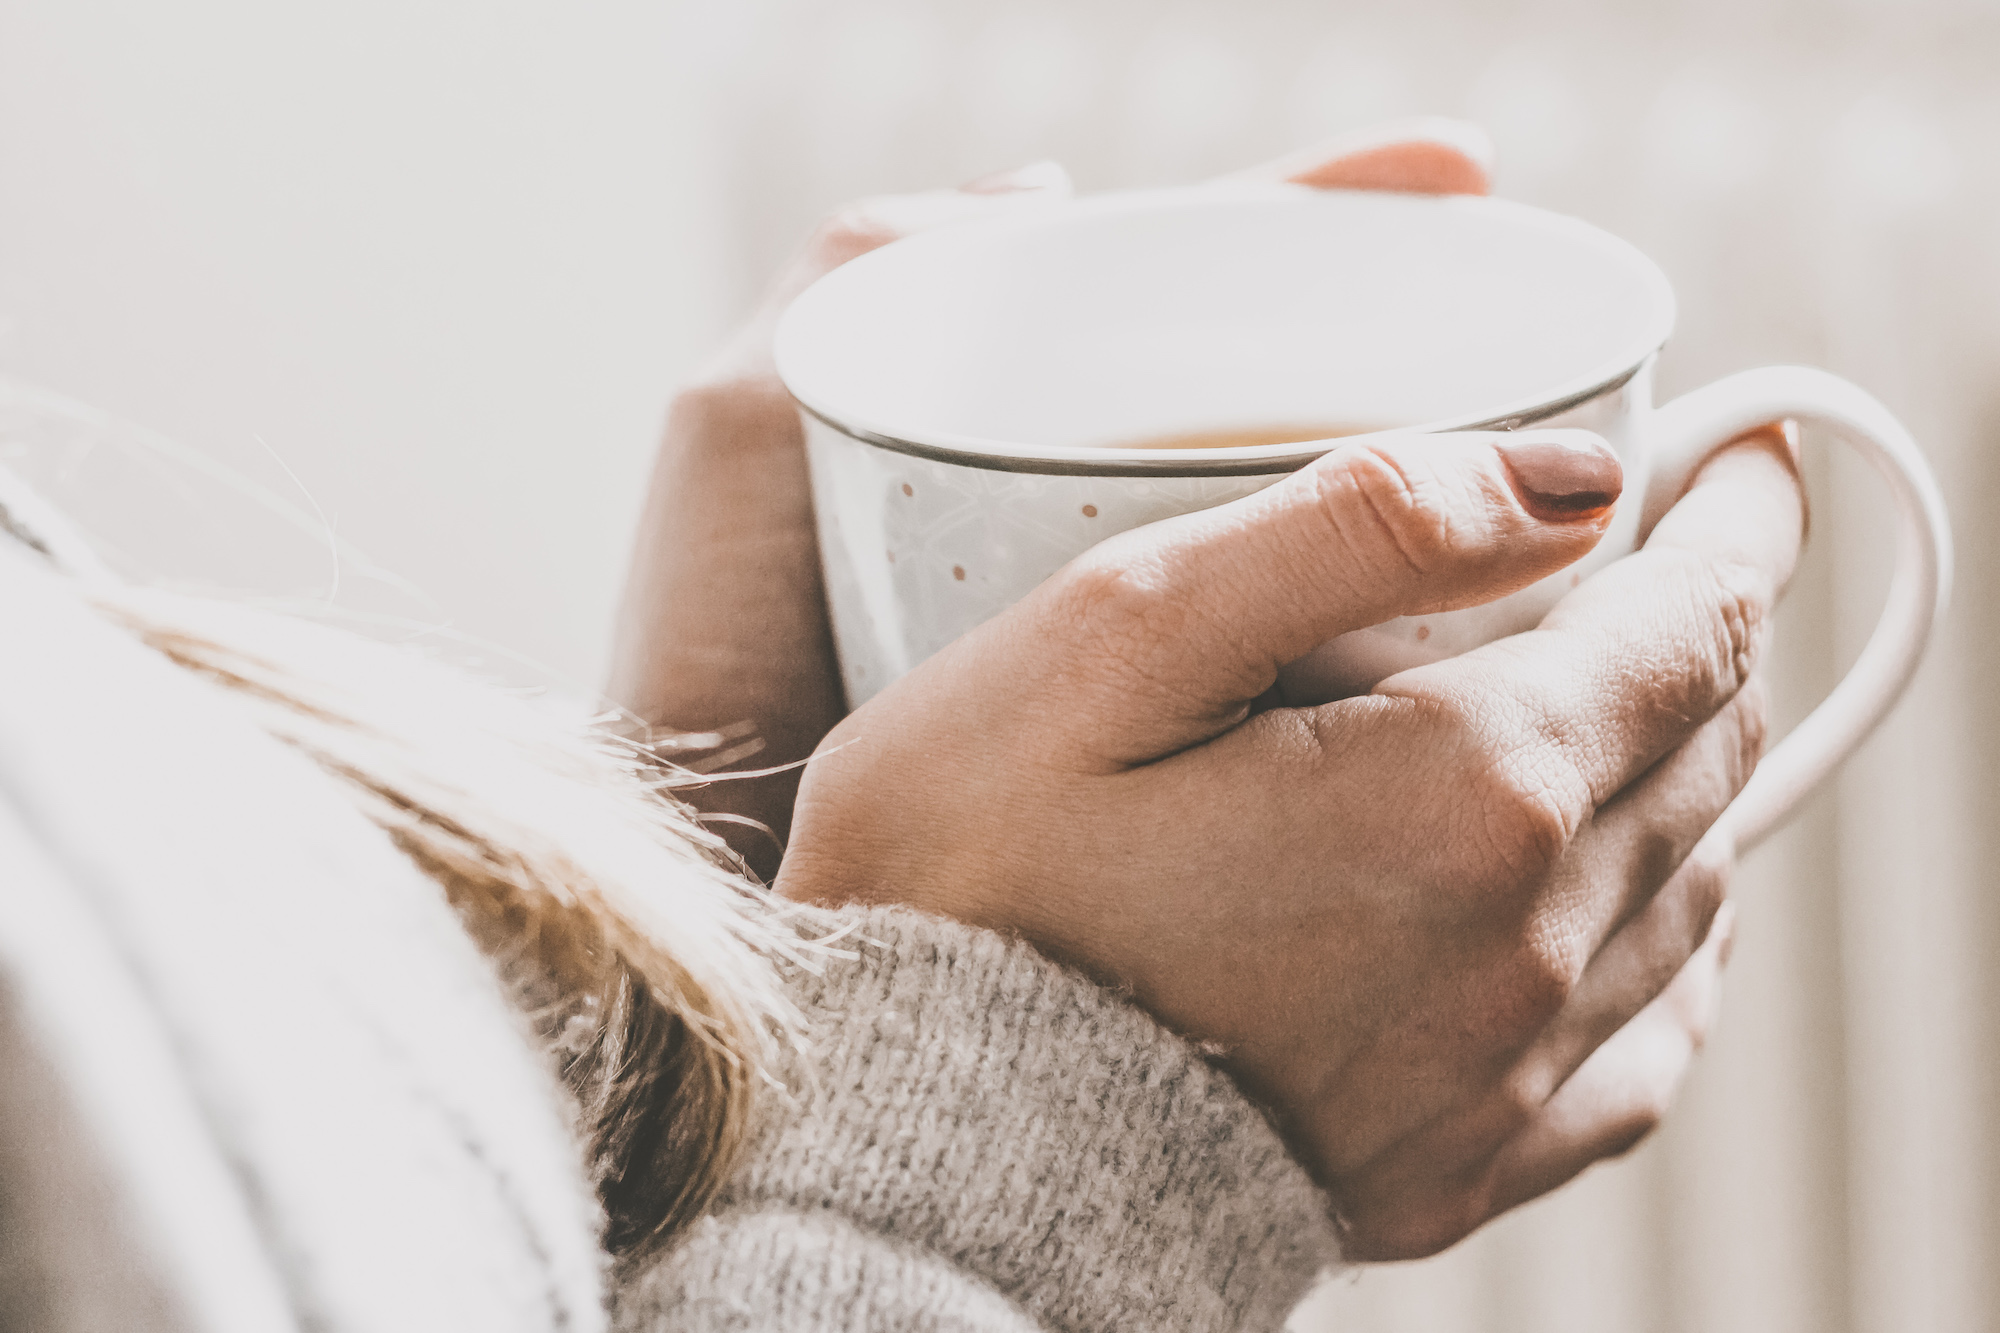 Junge Frau wärmt Hände an Teetasse